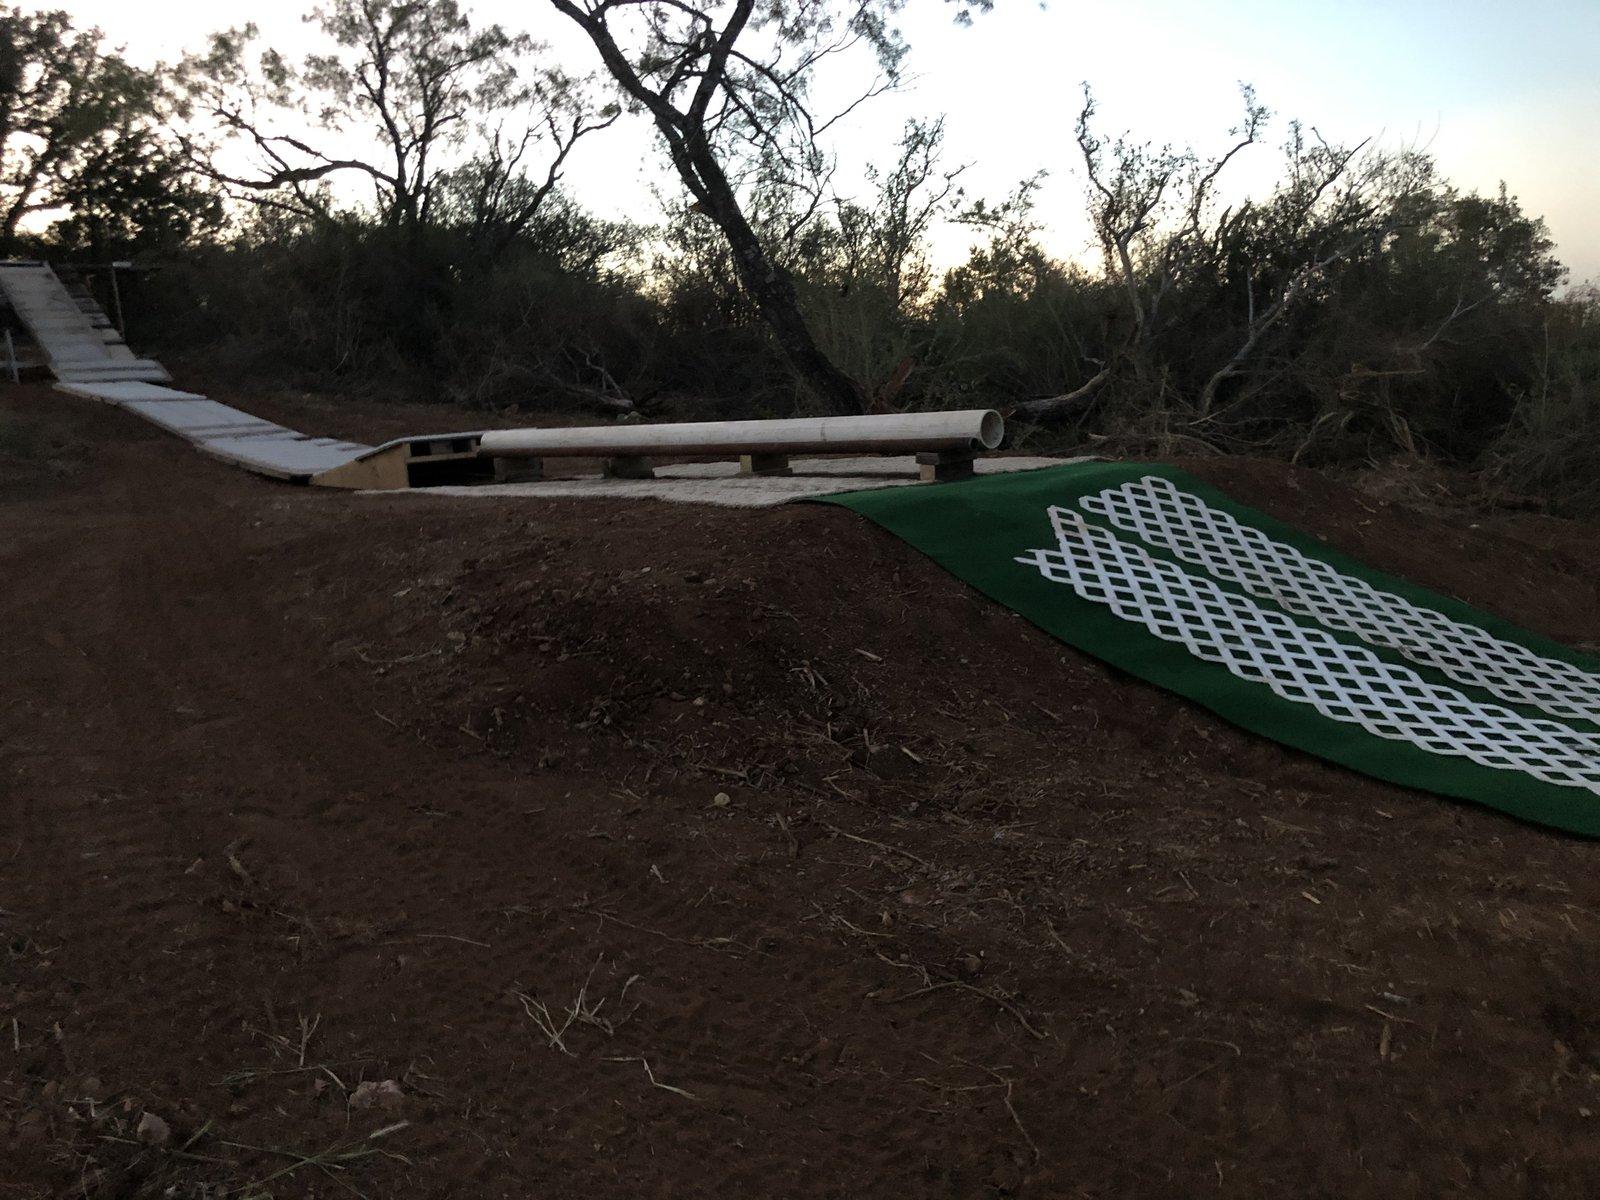 Texas M-Snow backyard set up